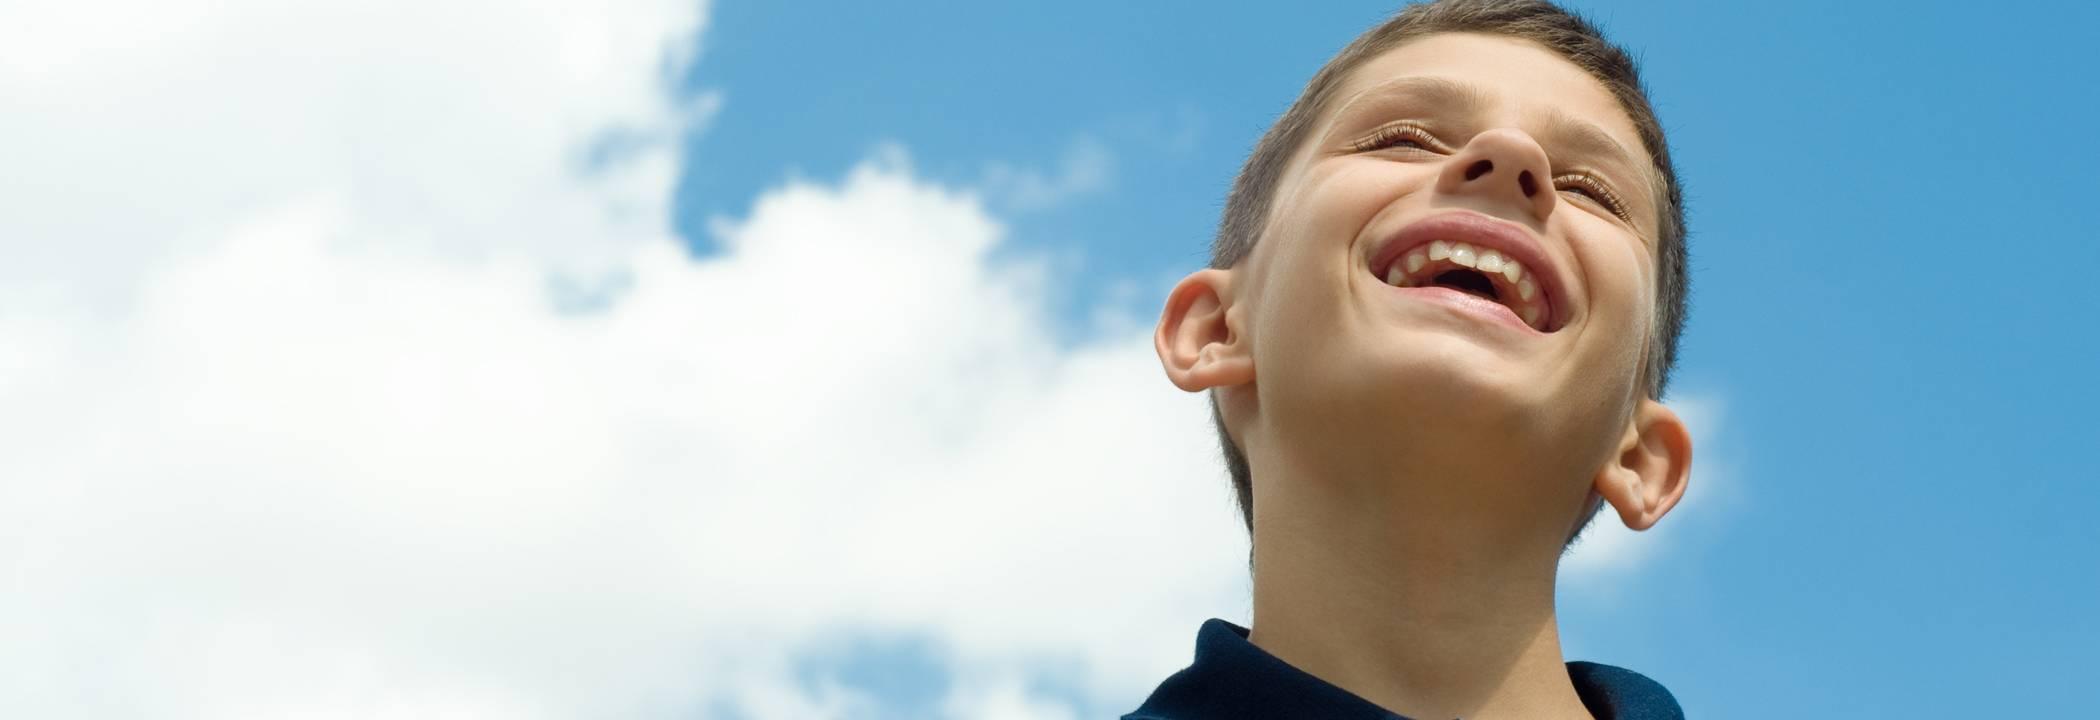 white_boy_smiling_blue_sky_on_rt_CROP